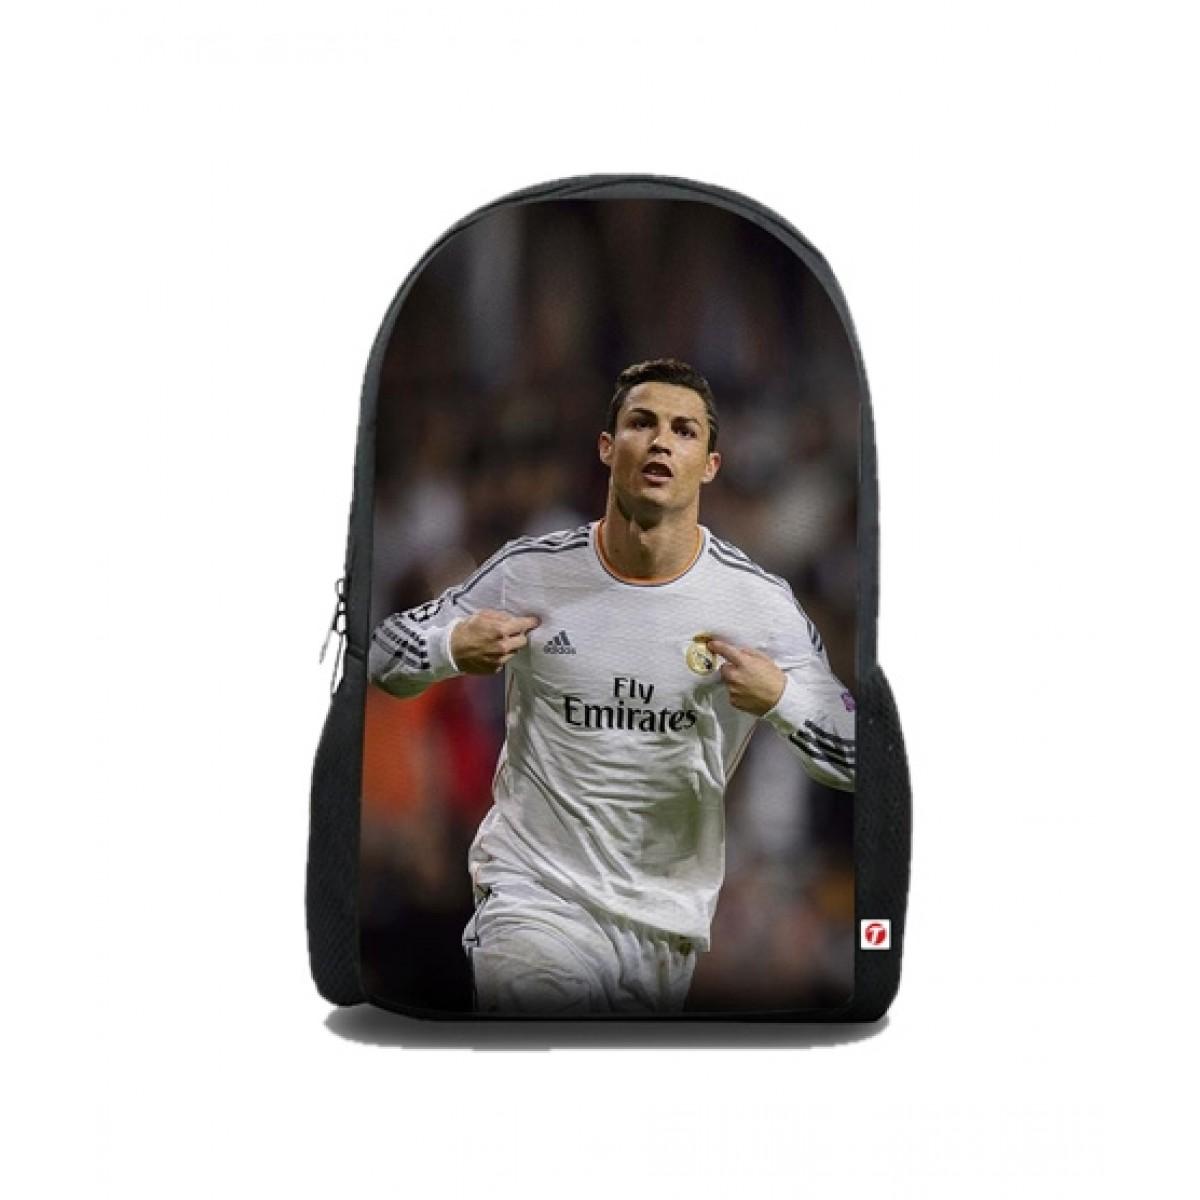 Trackrroblox Buy Trackrroblox At Best Price In Pakistan Traverse Ronaldo Digital Printed Backpack Price In Pakistan Buy Ronaldo Digital Printed Backpack 0140 Ishopping Pk